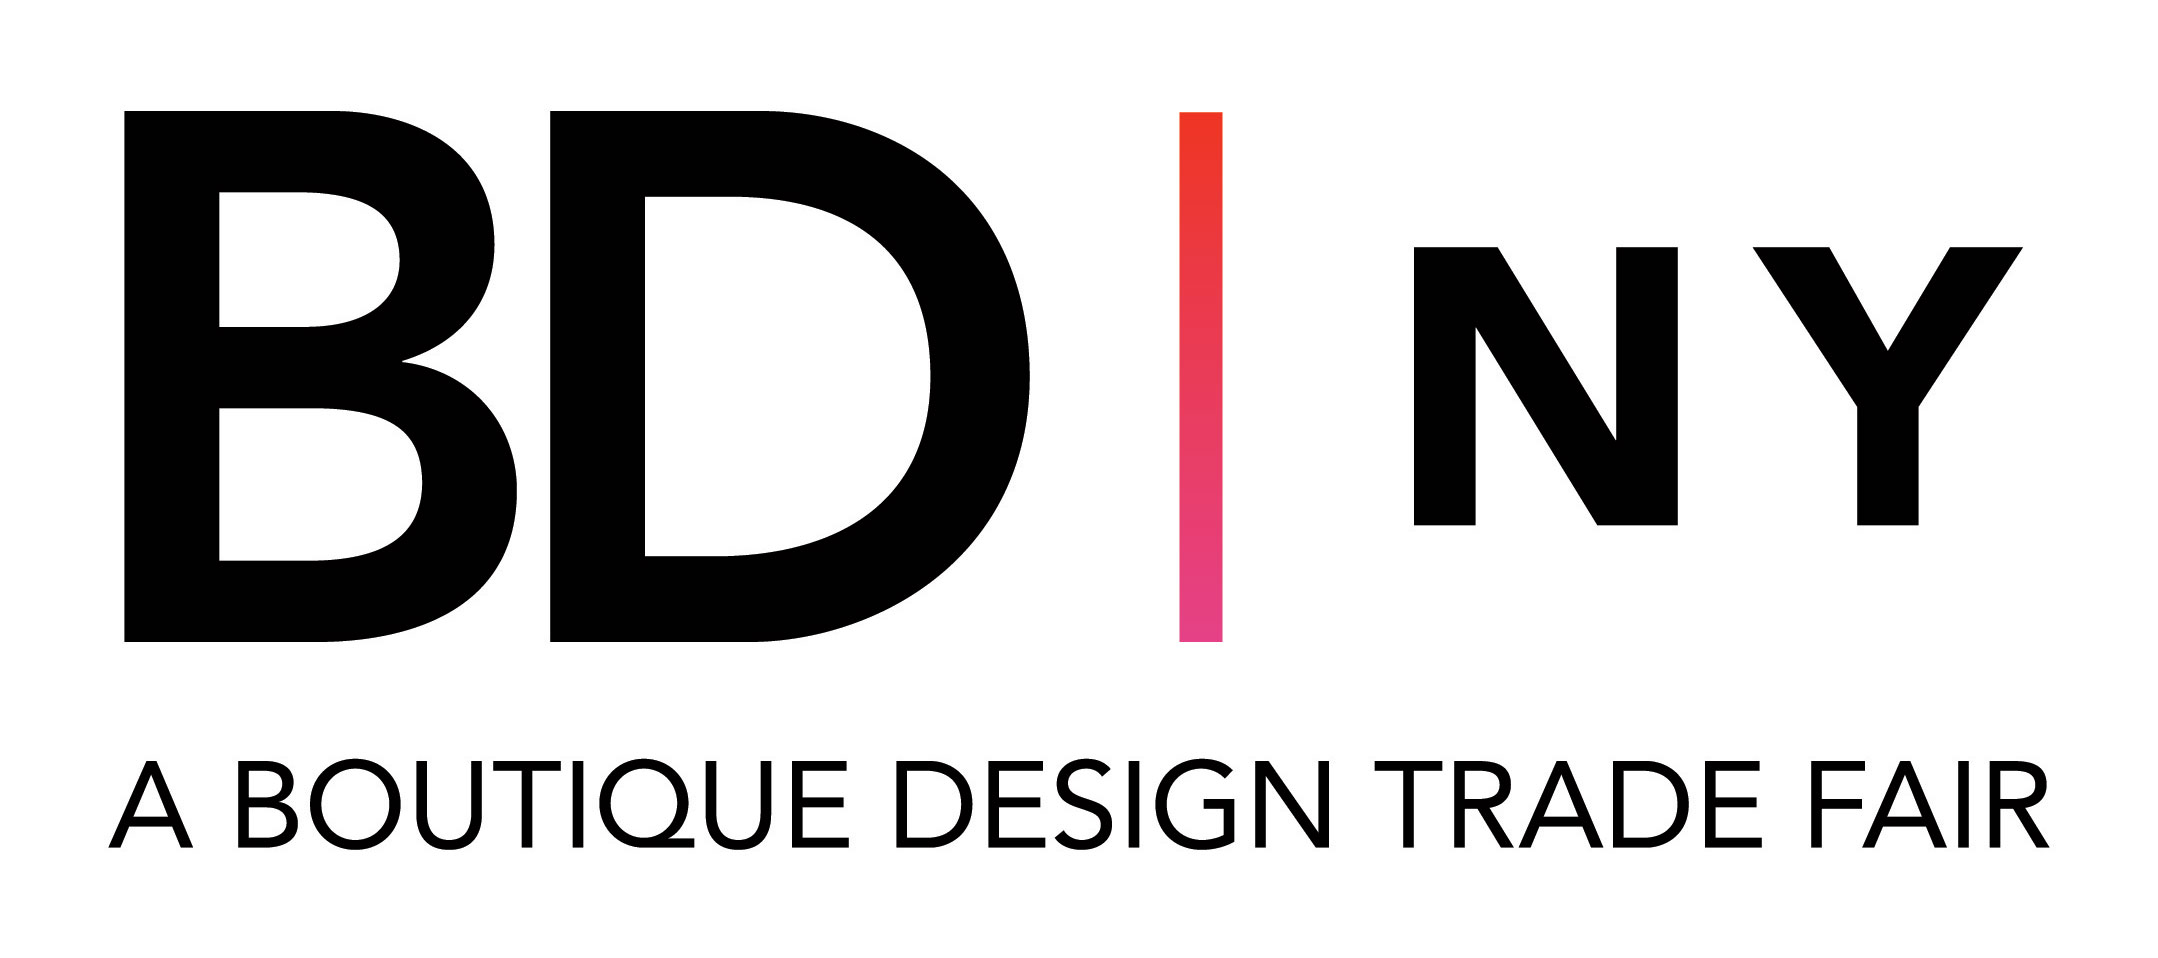 BDNY_2017_Logo-NoDatesNoLine.jpg